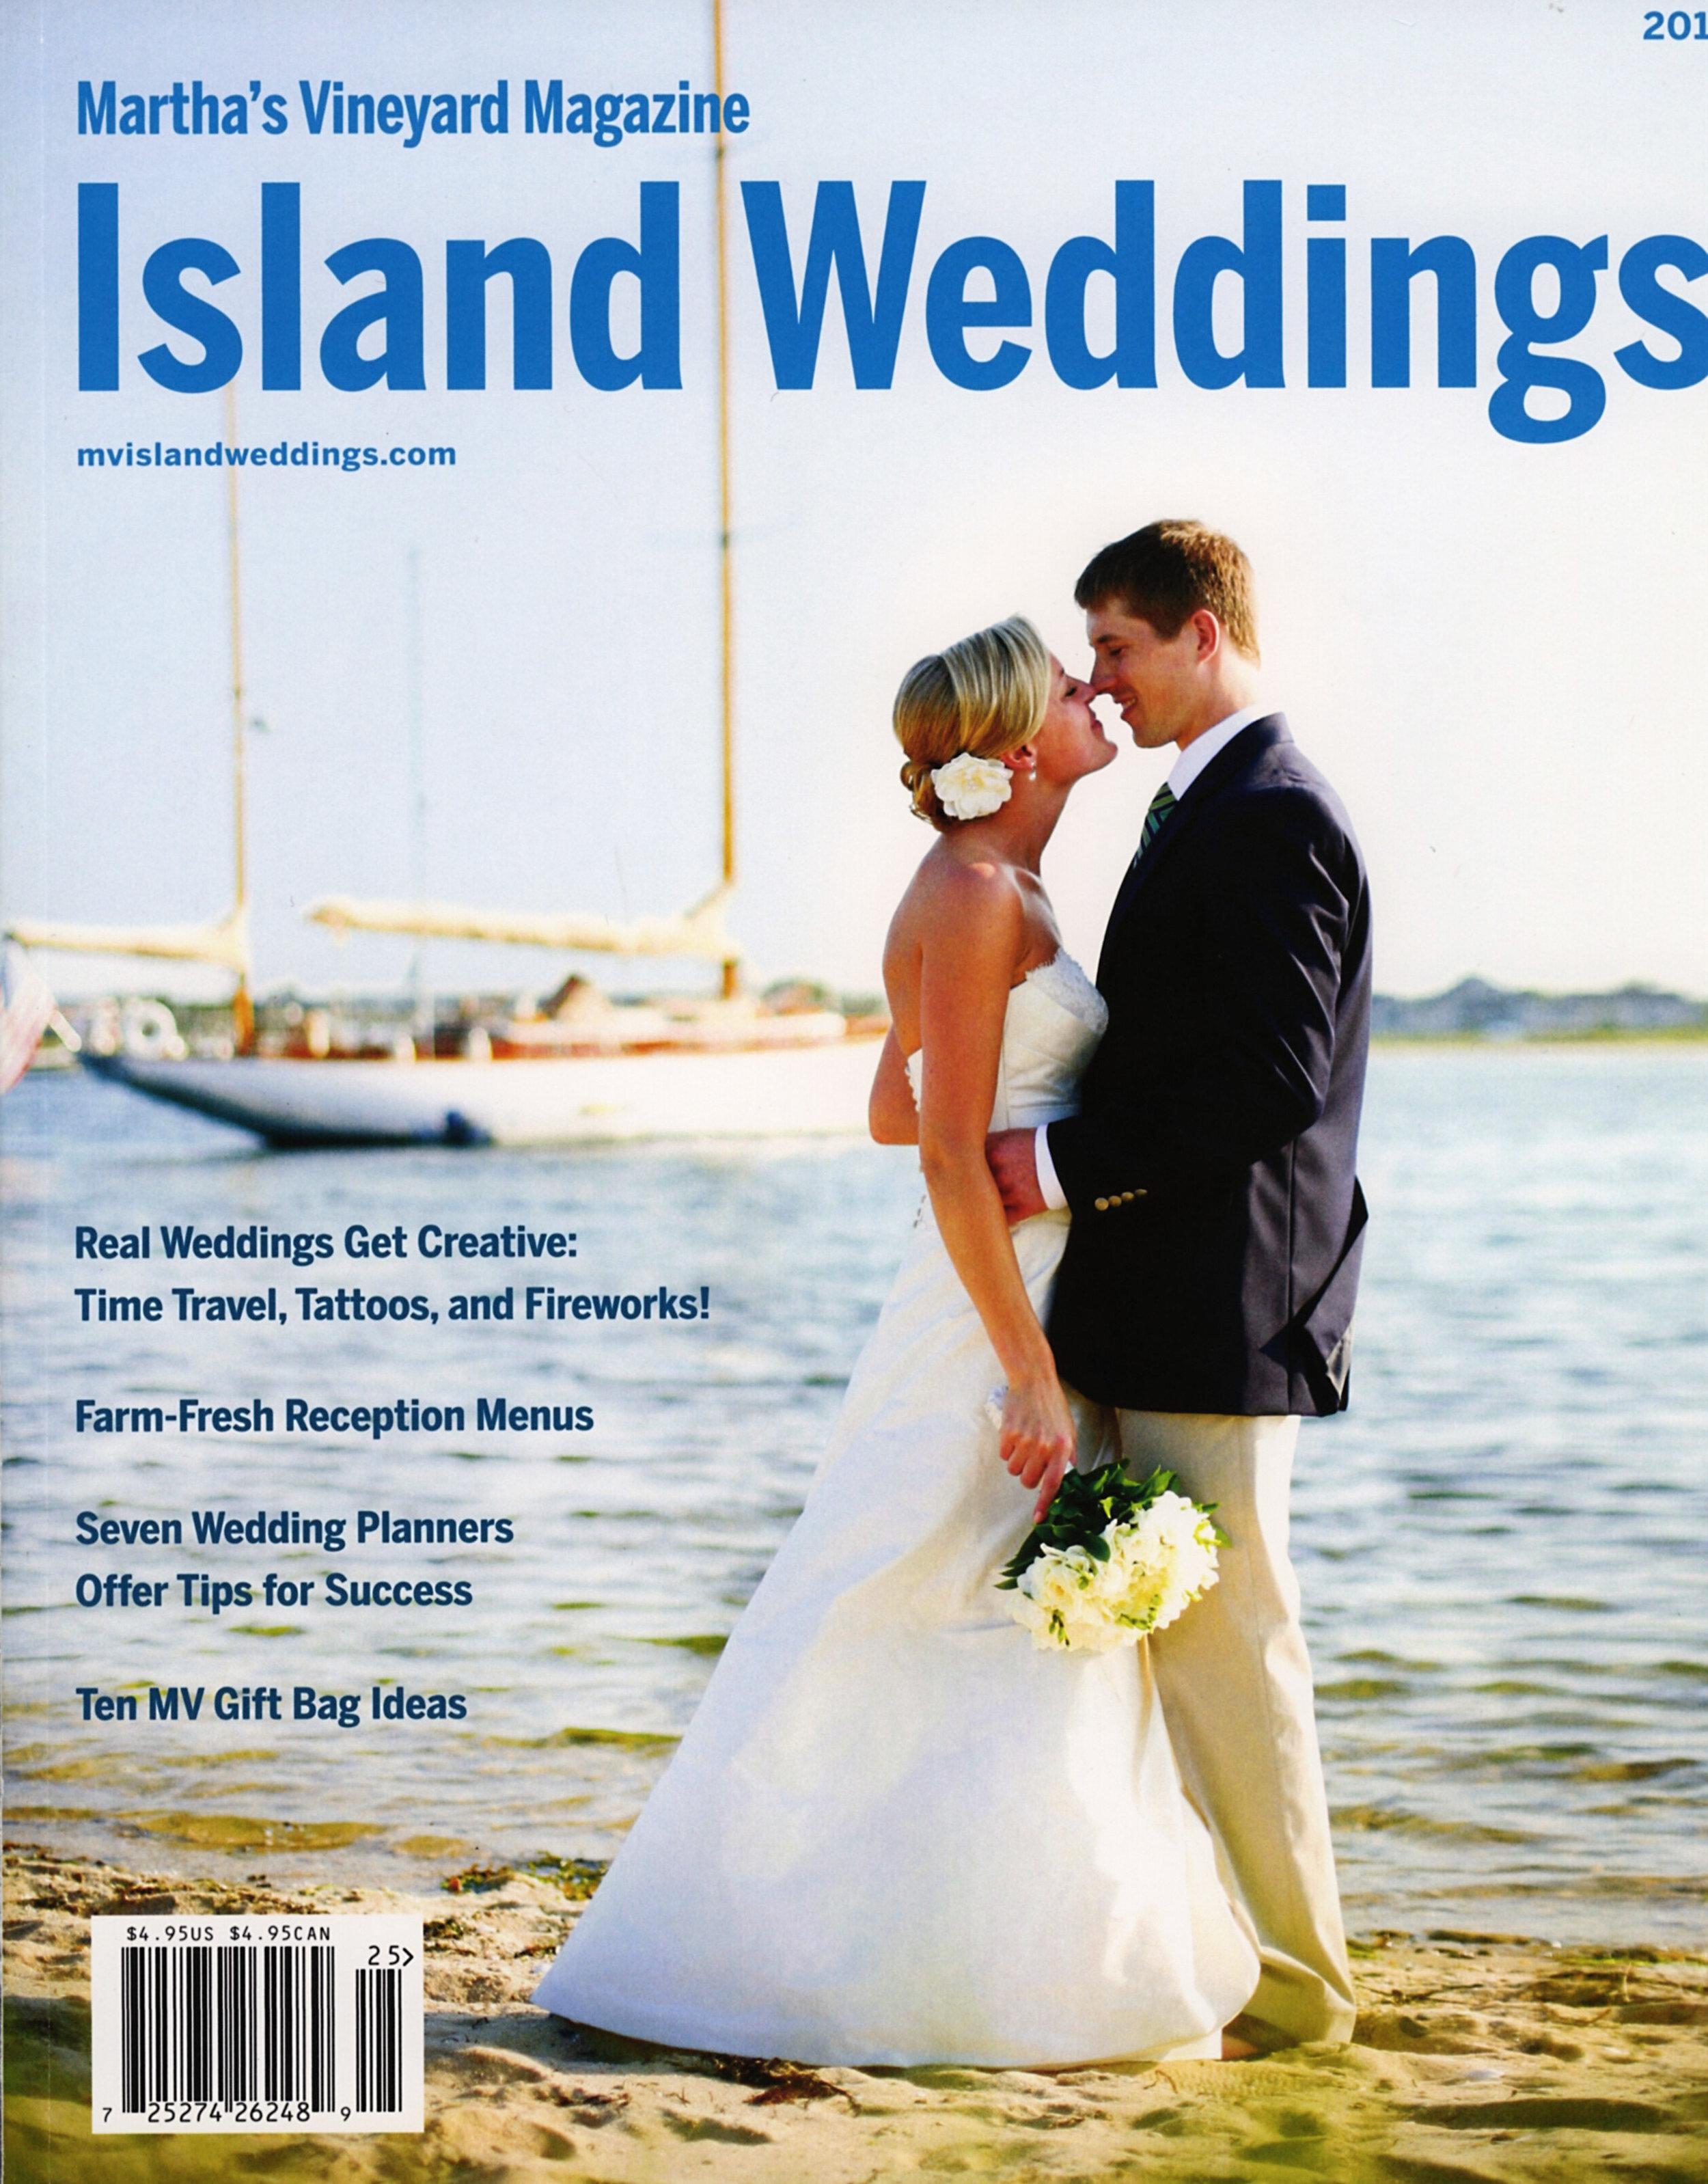 MvIsland weddings